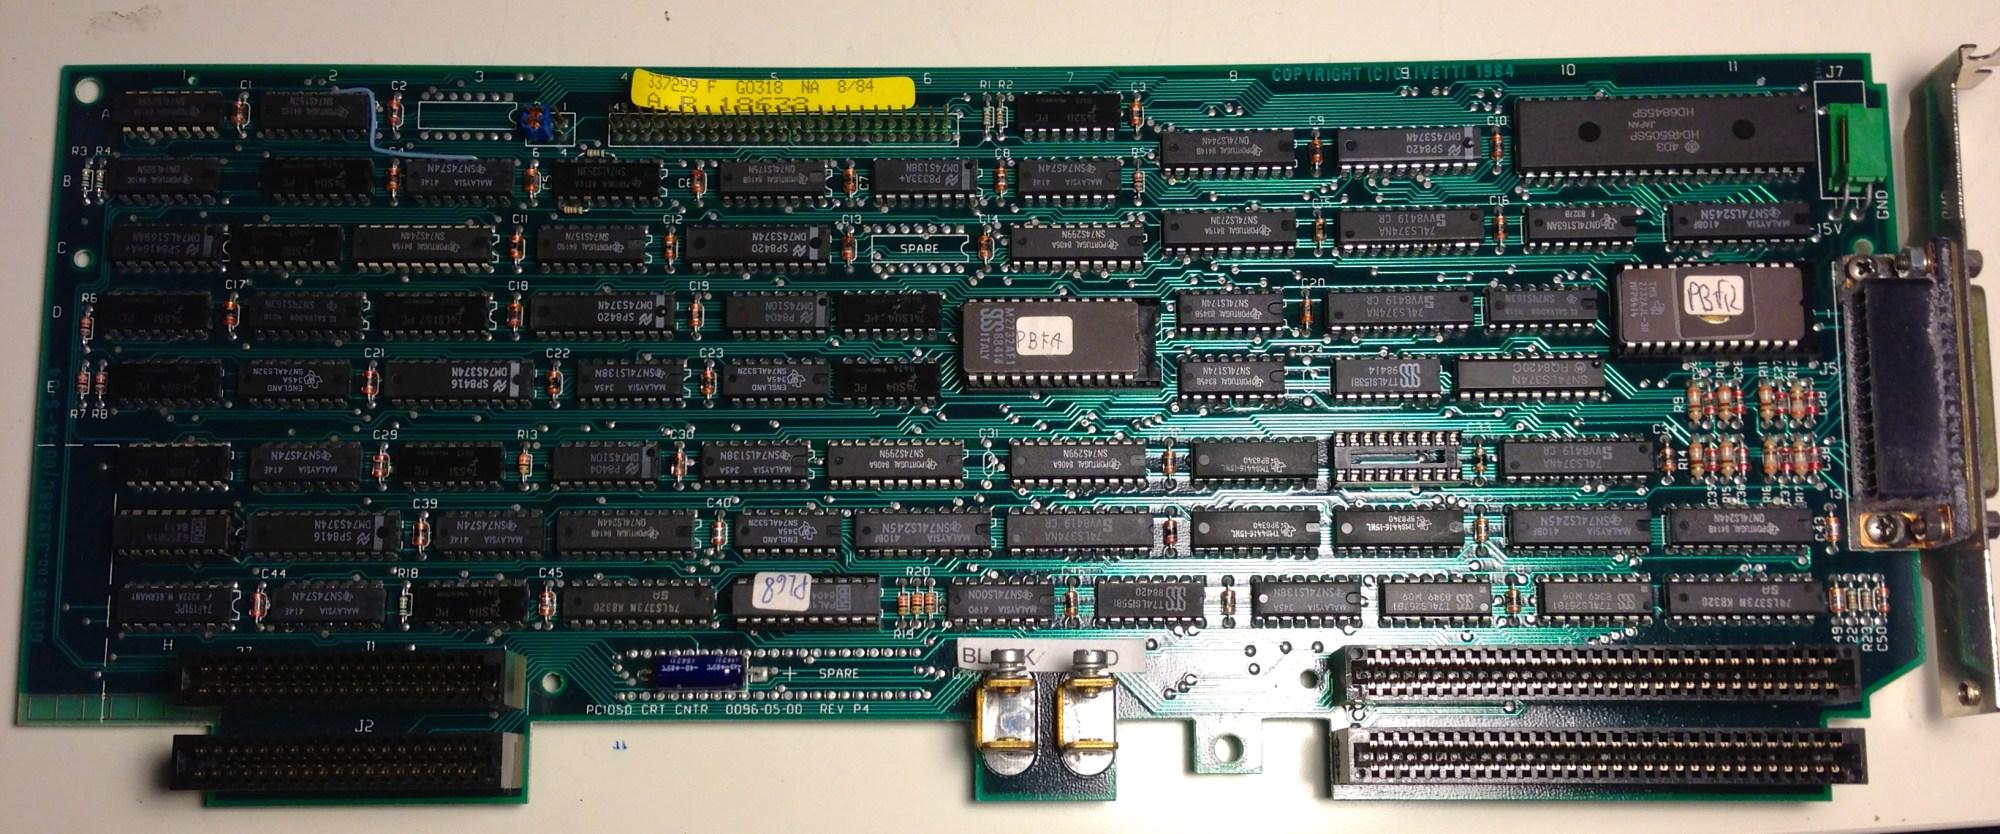 hight resolution of 6300 magnetek wiring diagram wiring diagram and schematics magnetek 6300a power center magnetek